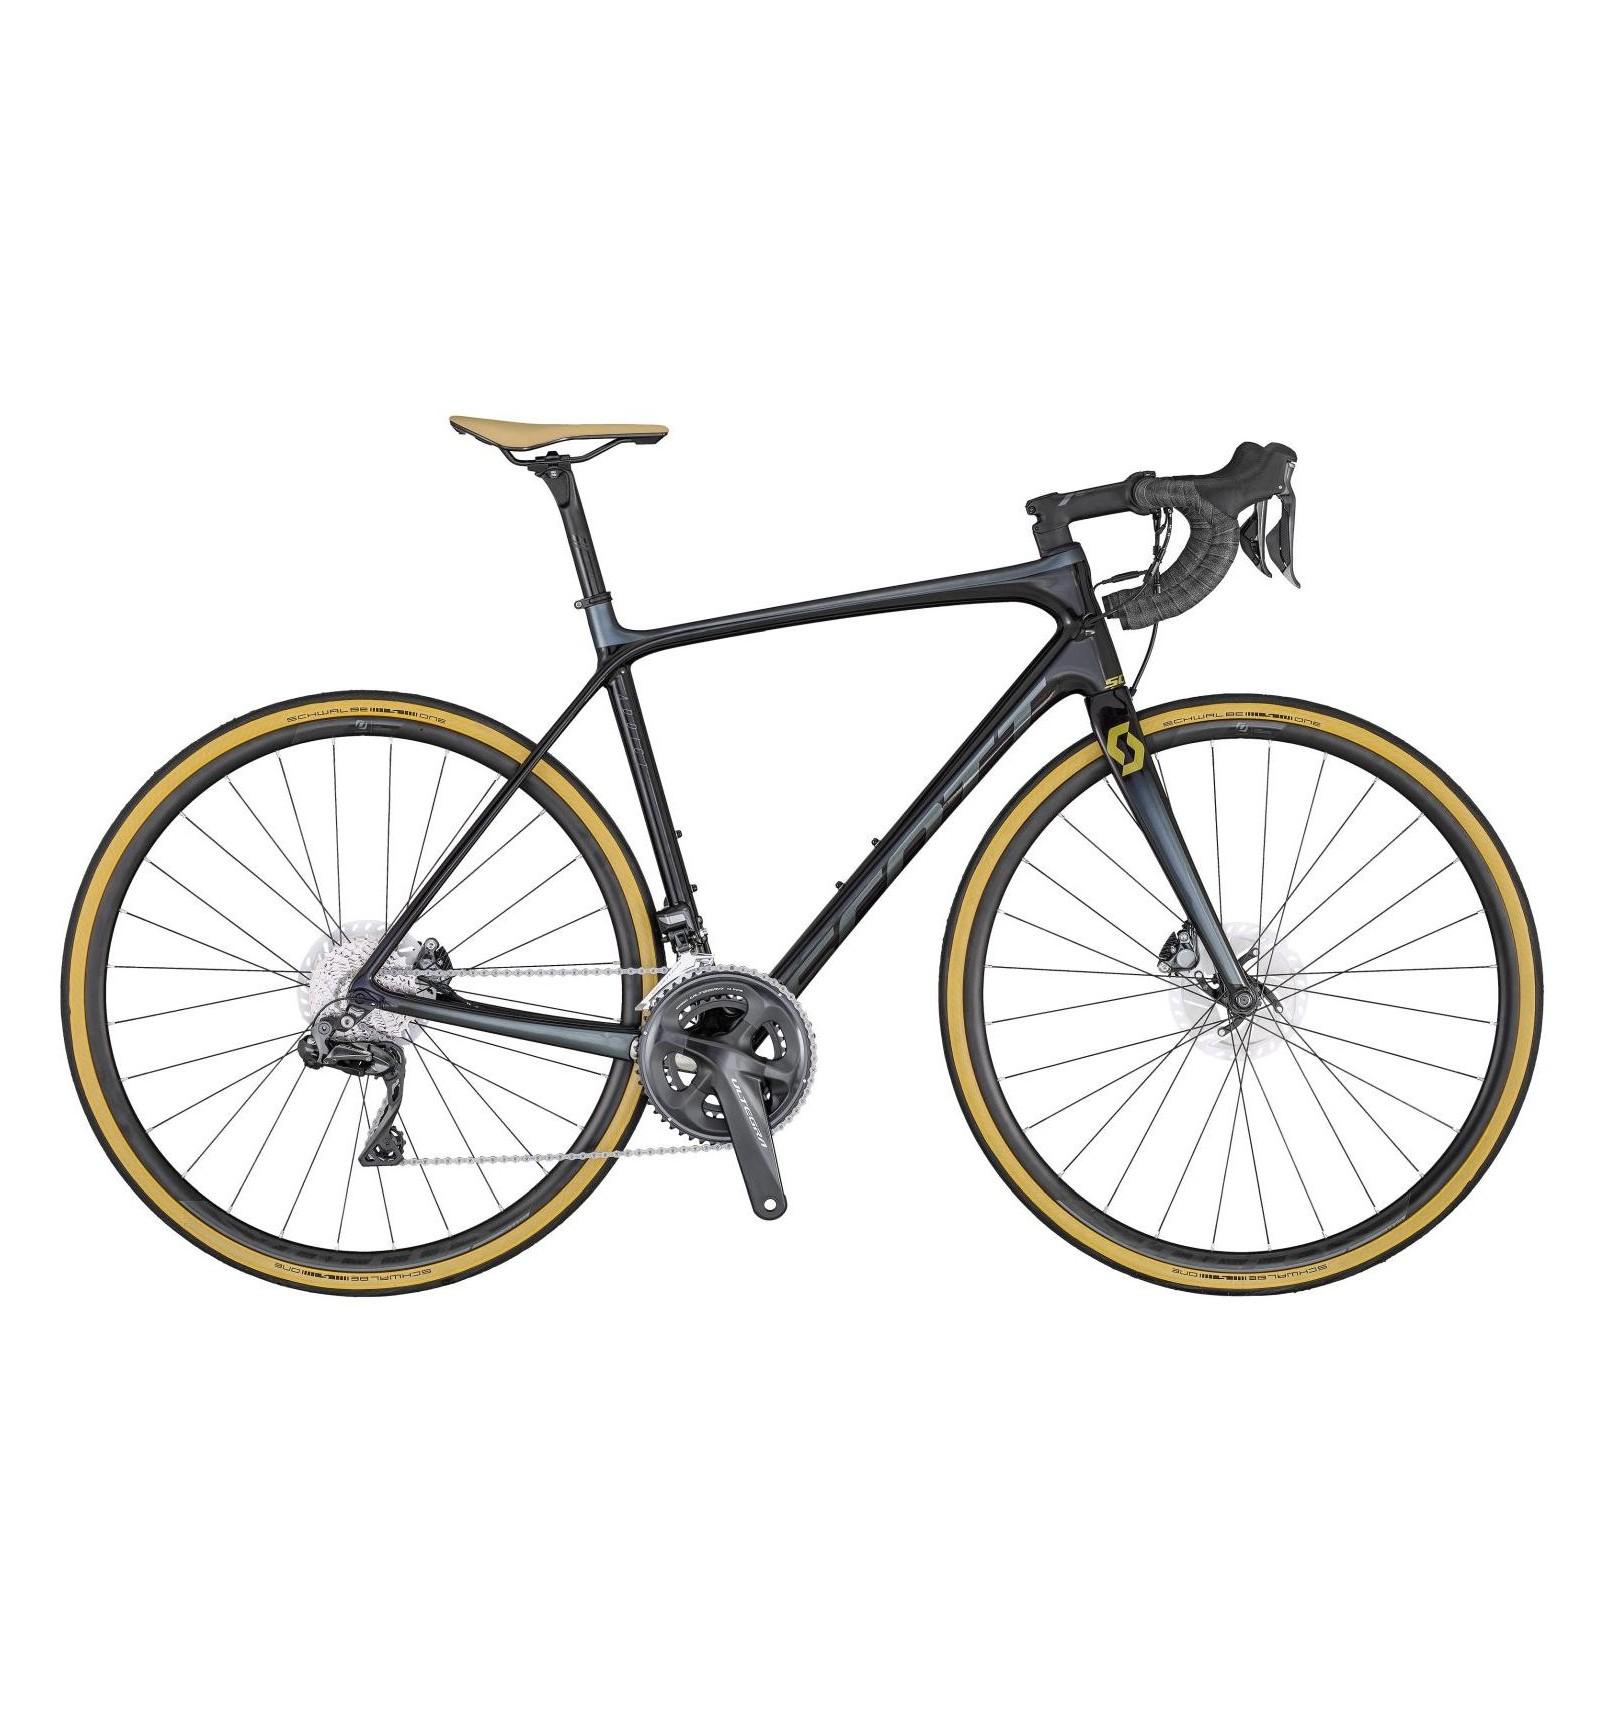 El topic de la bicicleta de montaña (mtb/btt) - Página 7 Bicicleta-bh-spike-27er-6-3-2015